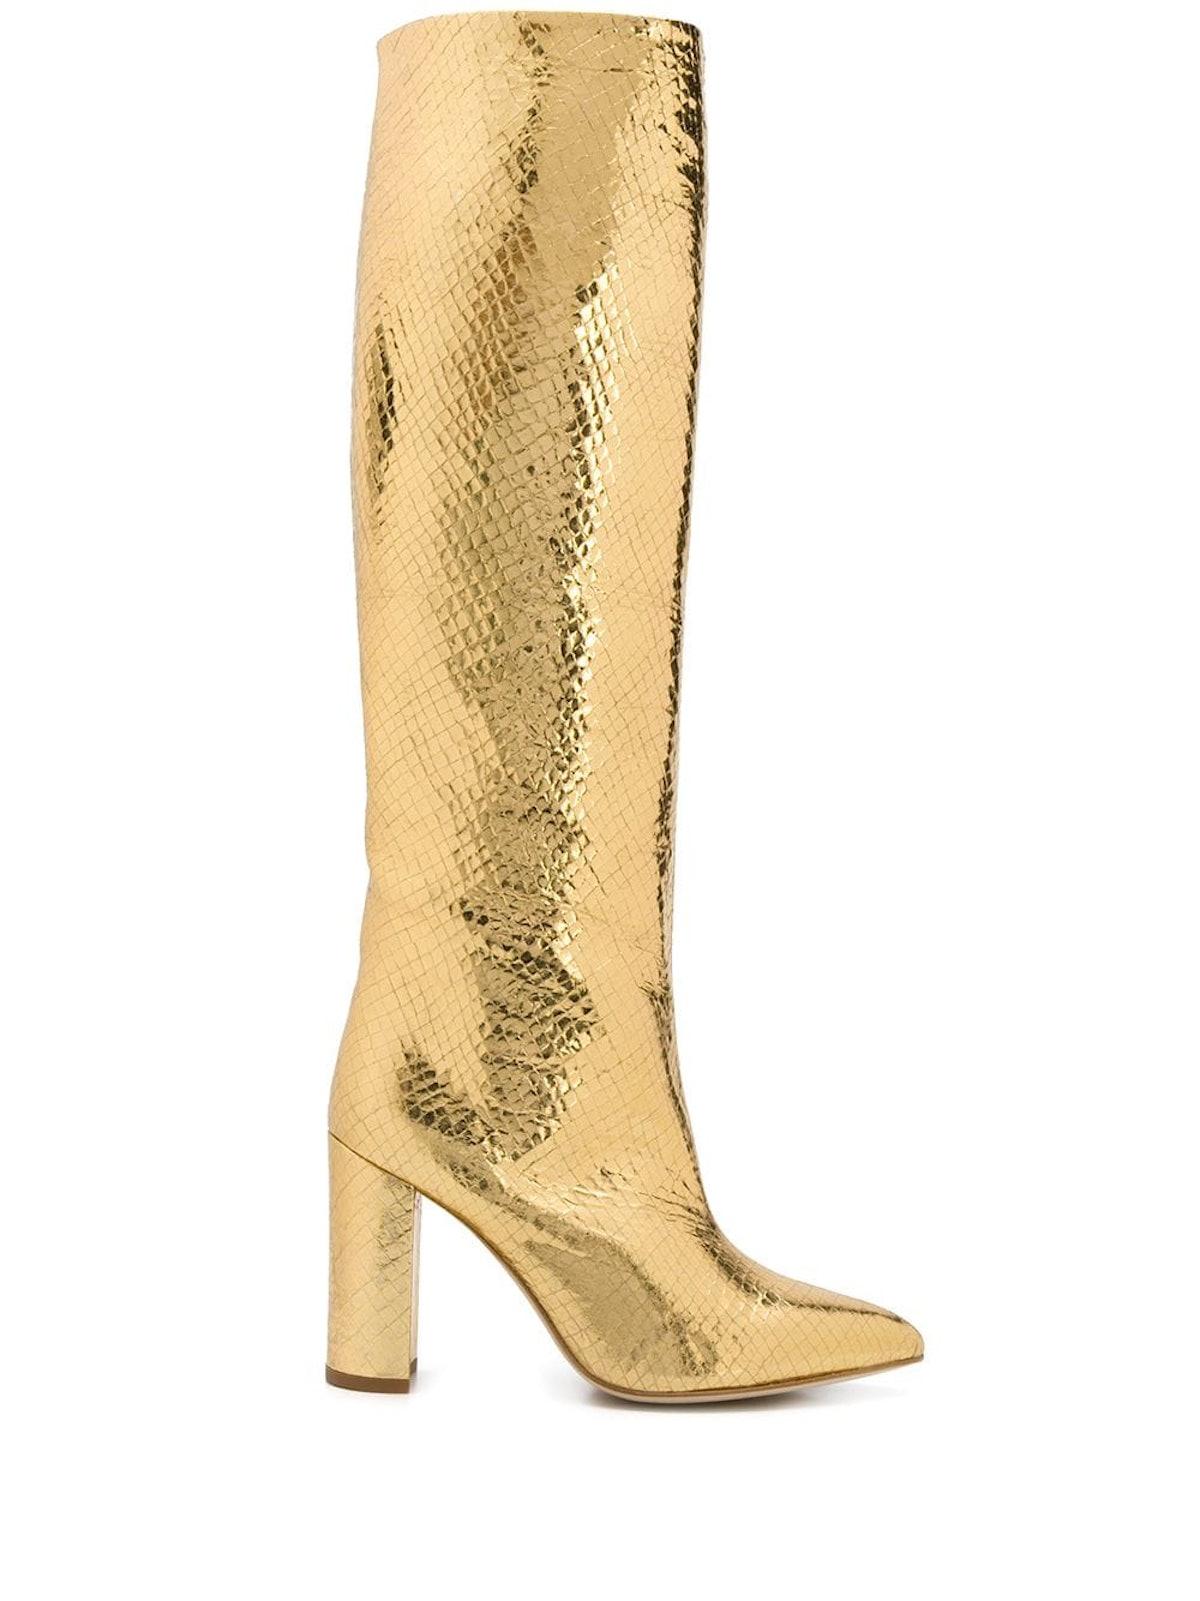 Gold Snakeskin Effect Boots